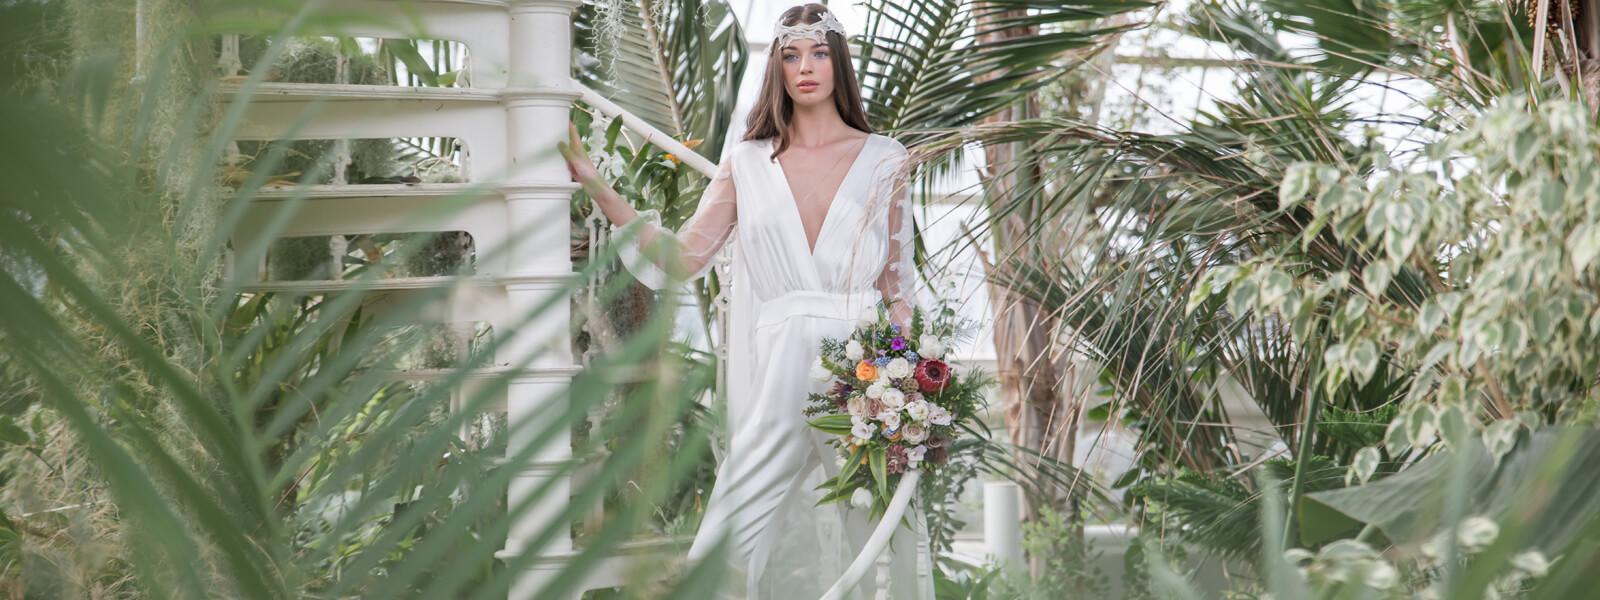 Eco Bridal Dress Designers Shop in London UK   Top Backless ...